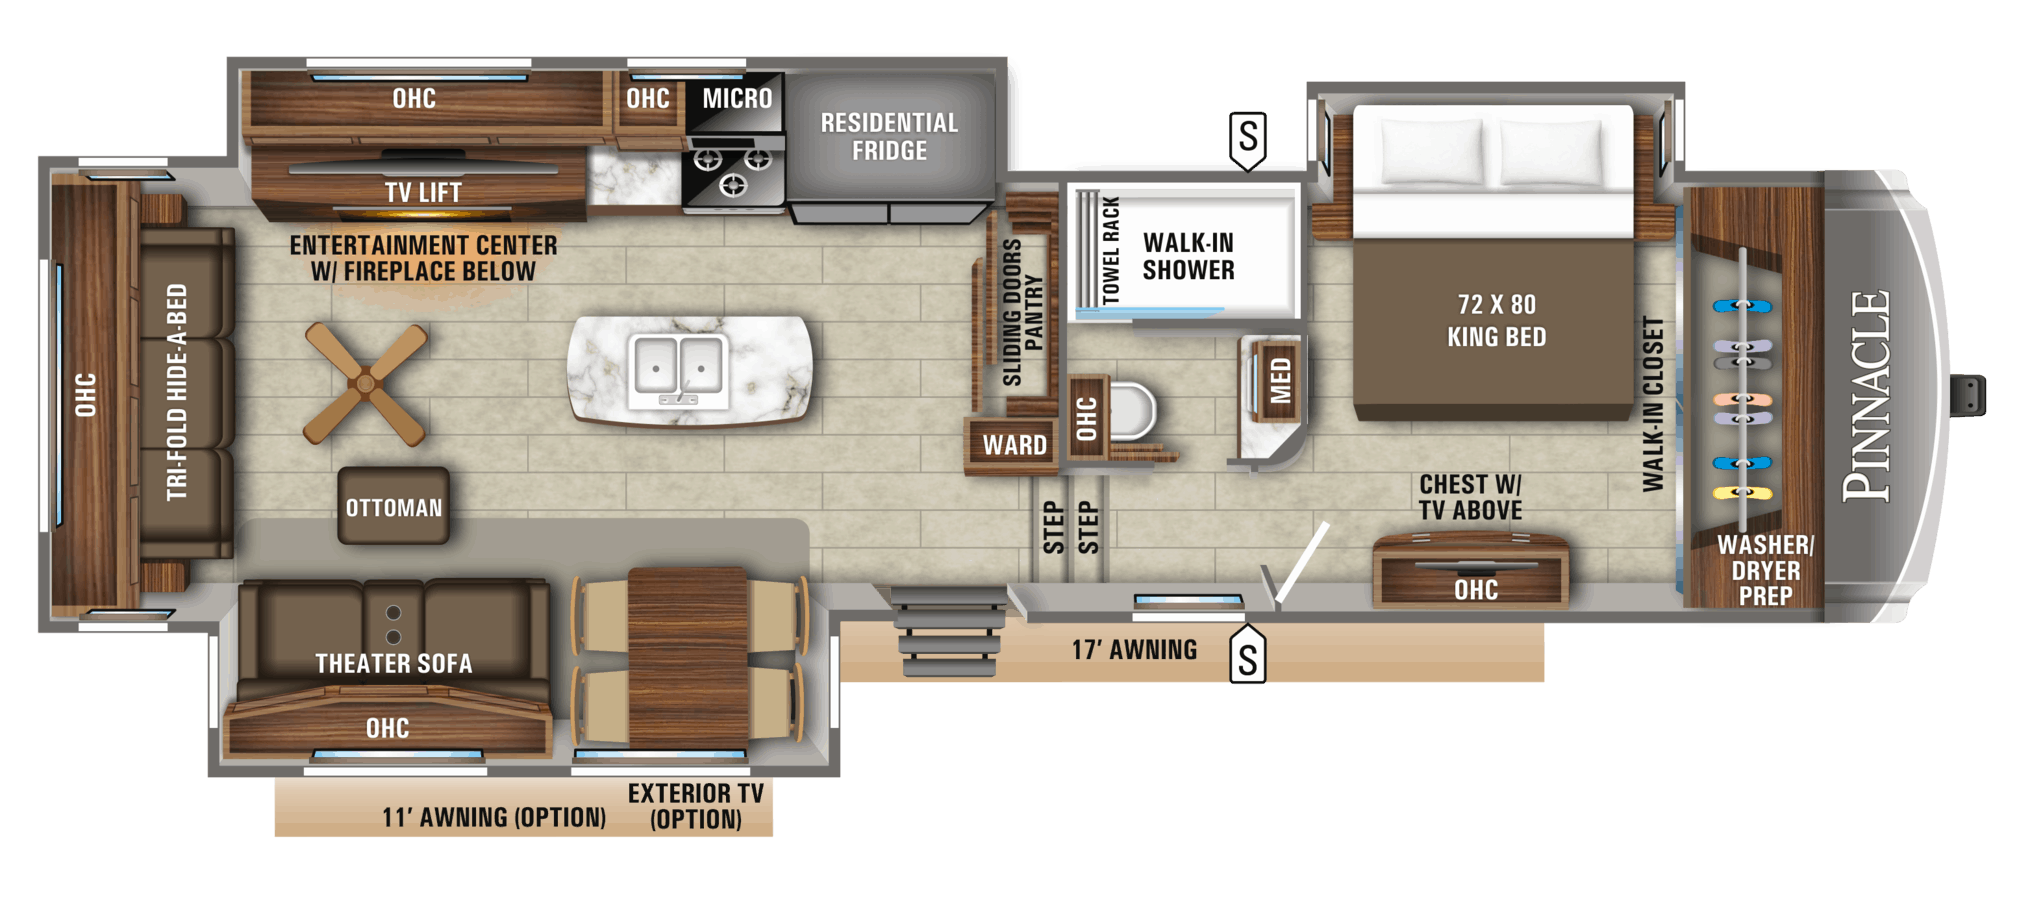 NEW 2019 Jayco PINNACLE 36KPTS - Rick's RV Center